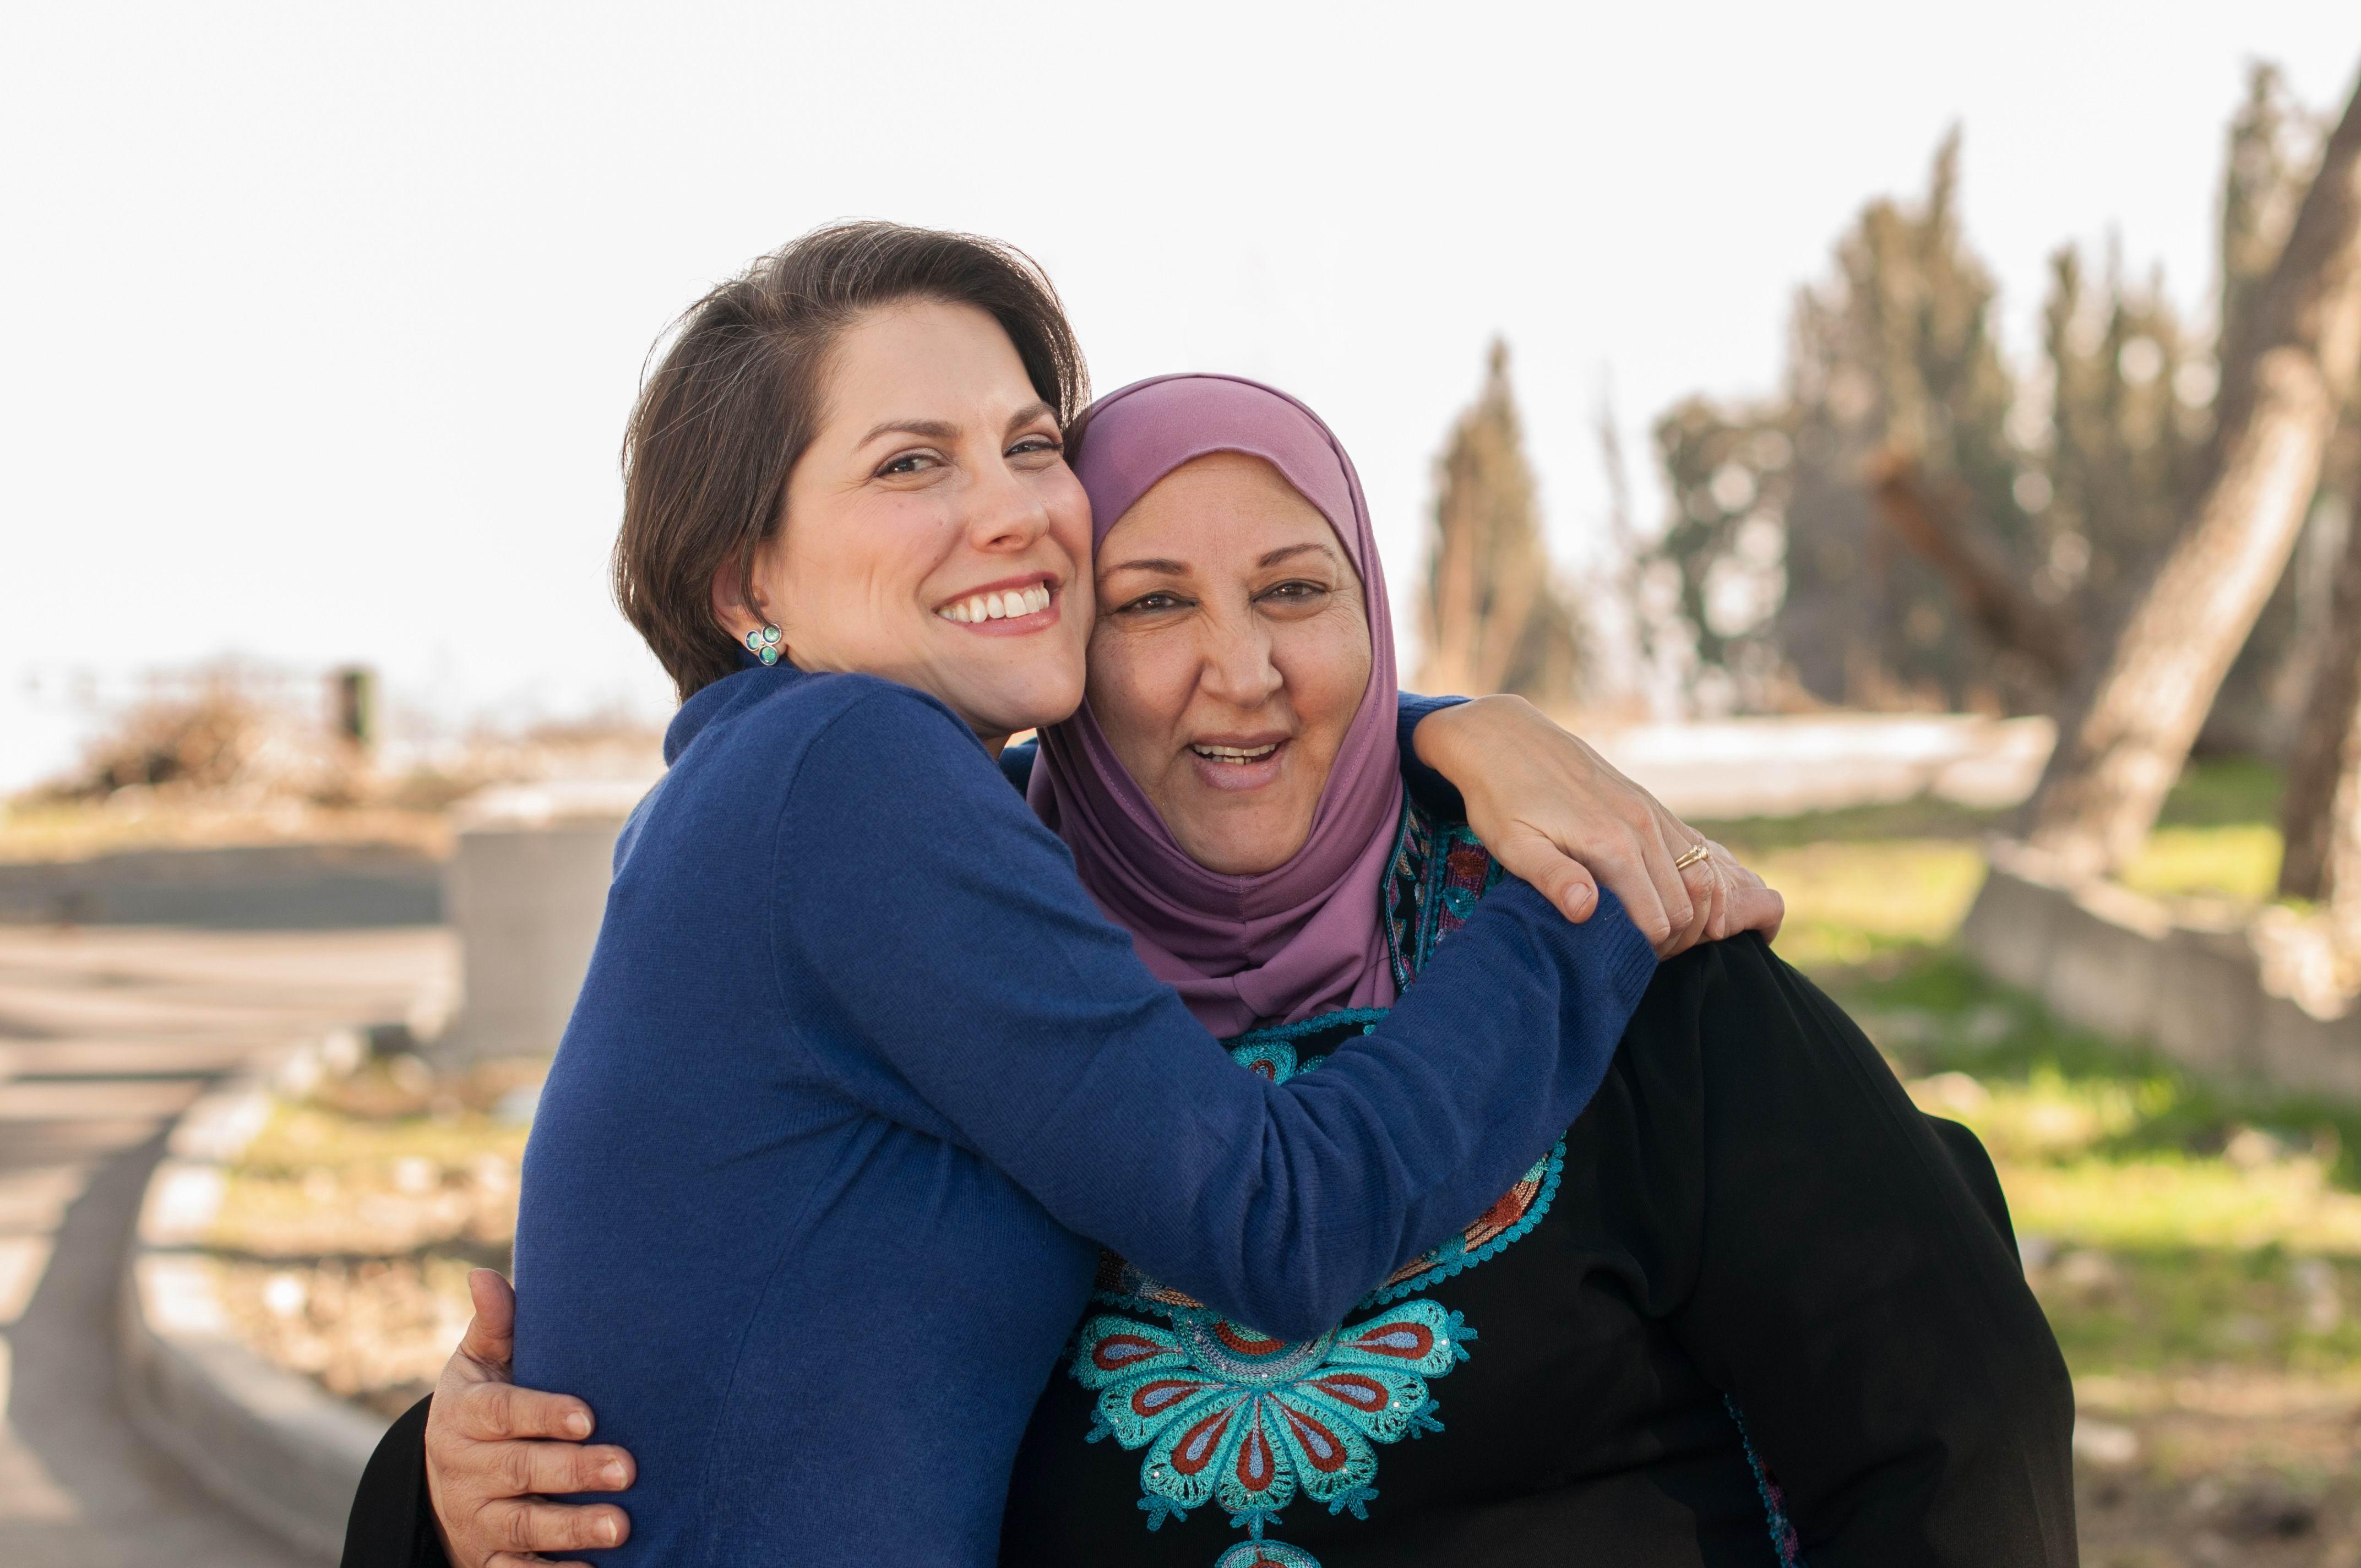 Ruth and Ibtisam hugging - photo credit Yitz Woolf